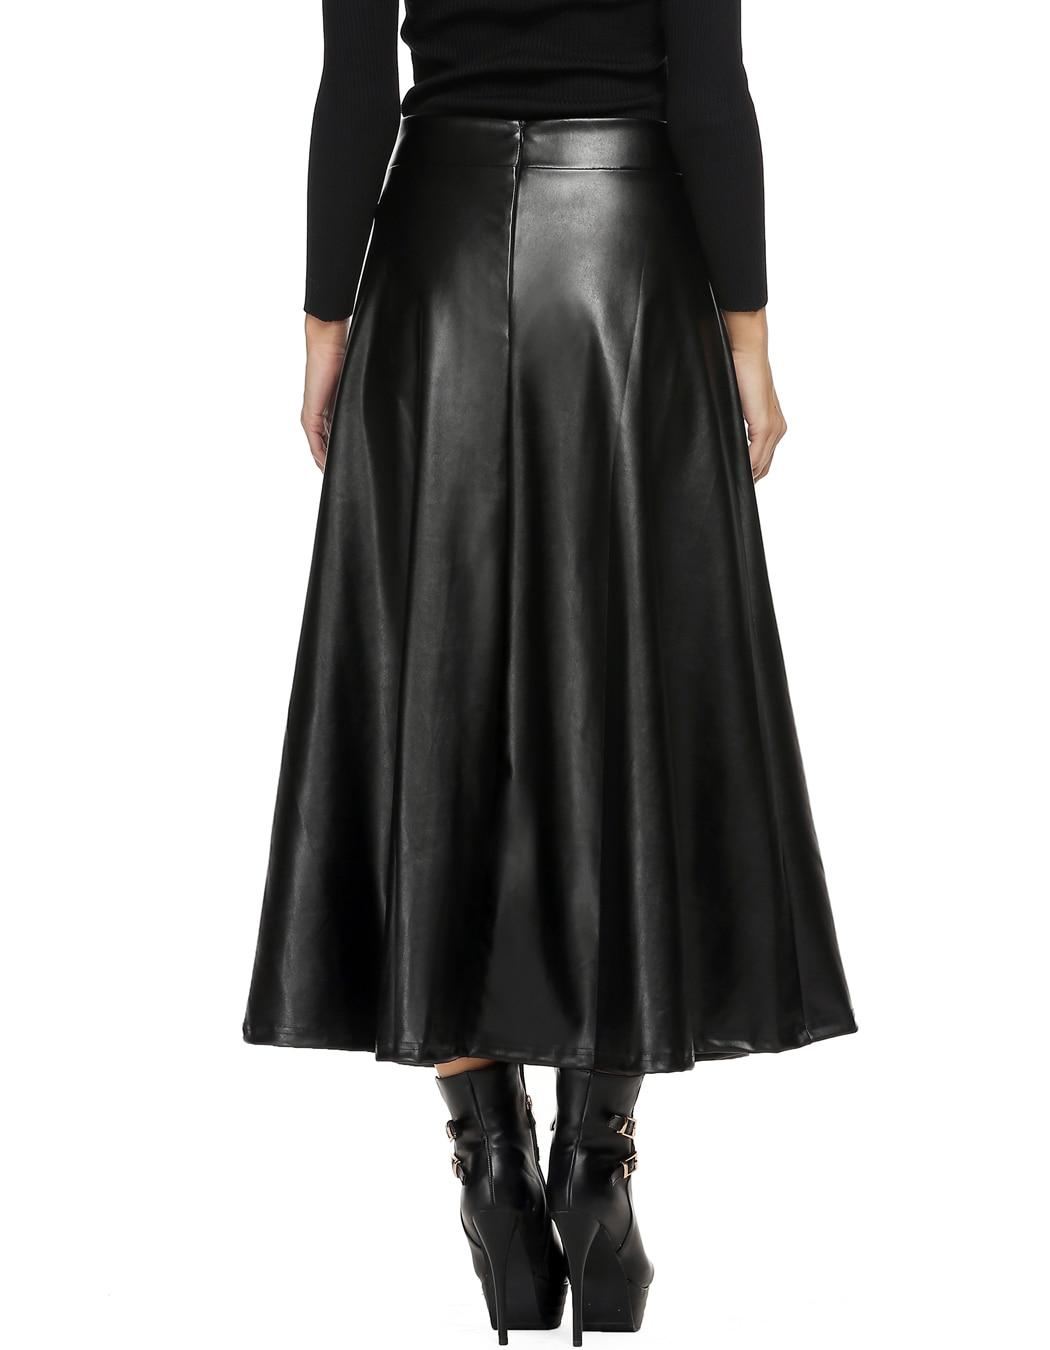 Winter Pu Leather Skirt Women Maxi Long Skirts Womens High Waist Slim Autumn Vintage Pleated Skirt Black Xl Xxl 3